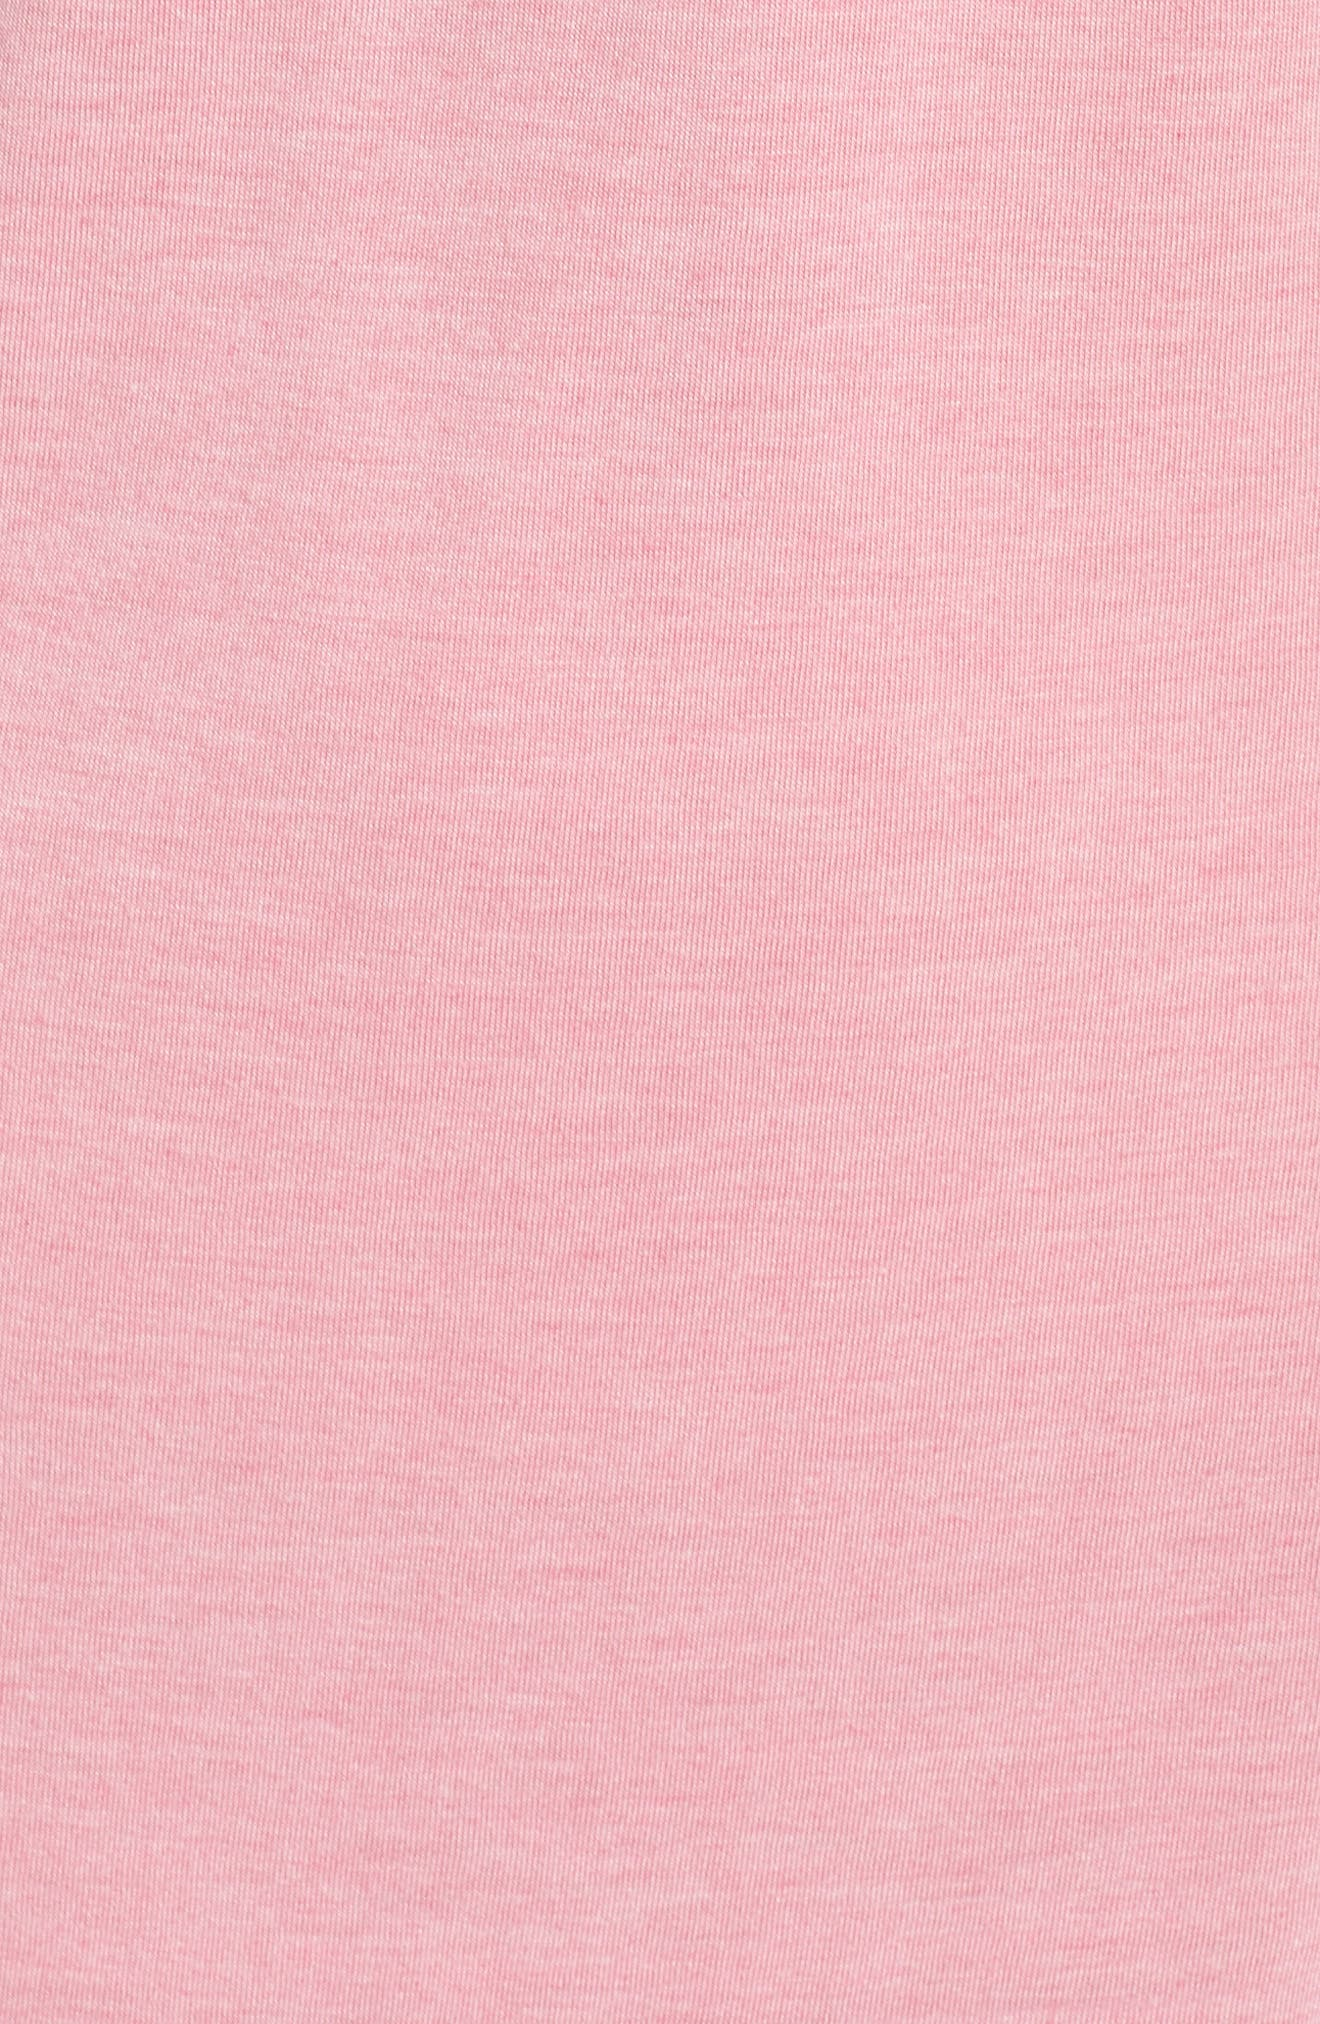 Shangri-La Chemise,                             Alternate thumbnail 6, color,                             Hibicus Pink